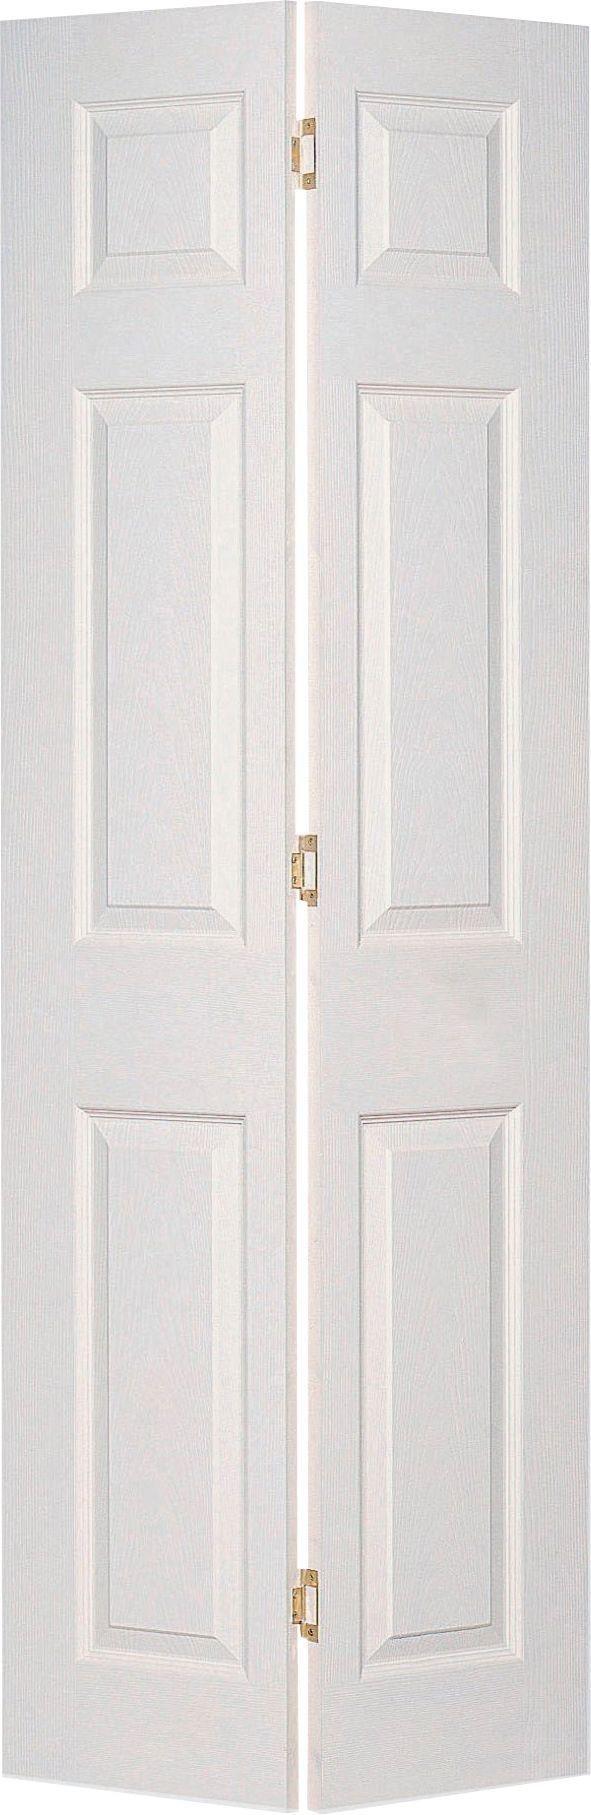 jeld wen 6 panel bi fold interior door 1981 x 762mm sc 1. Black Bedroom Furniture Sets. Home Design Ideas